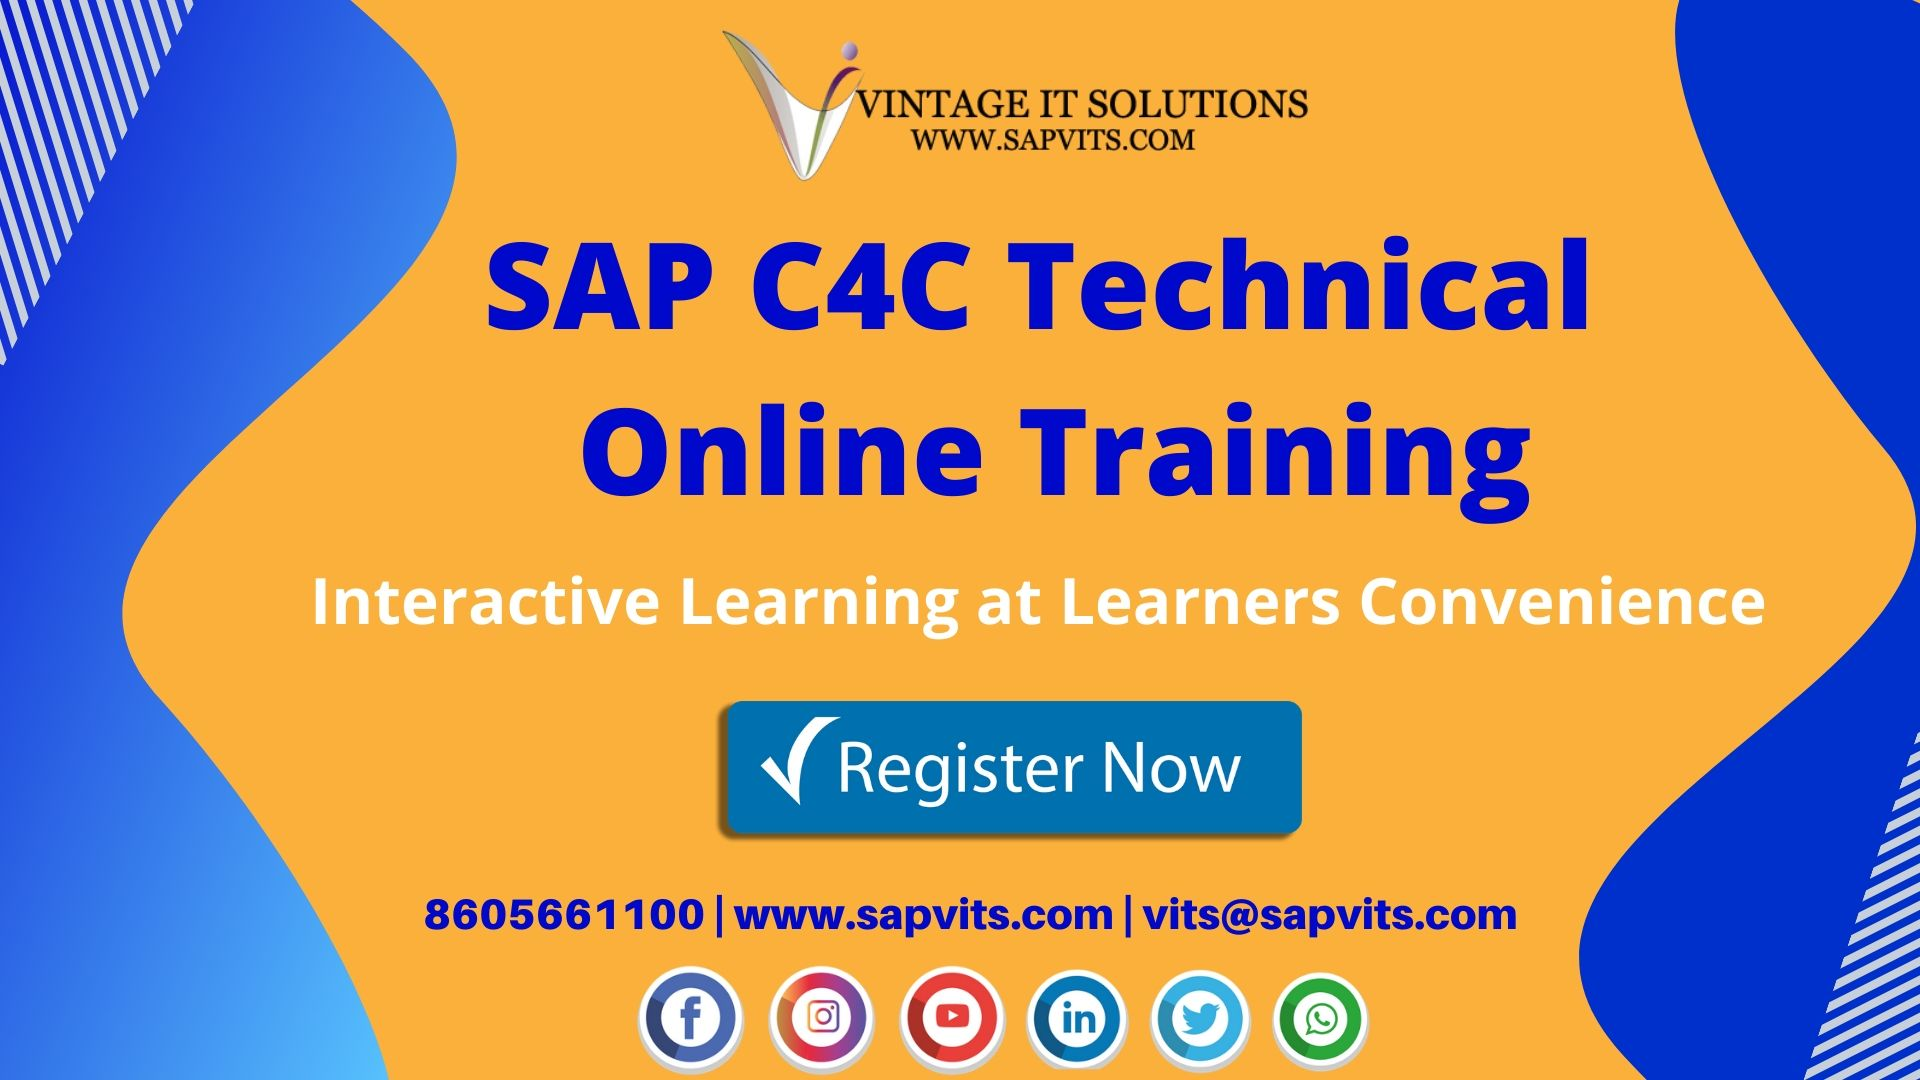 SAP C4C Technical Training | SAPVITS